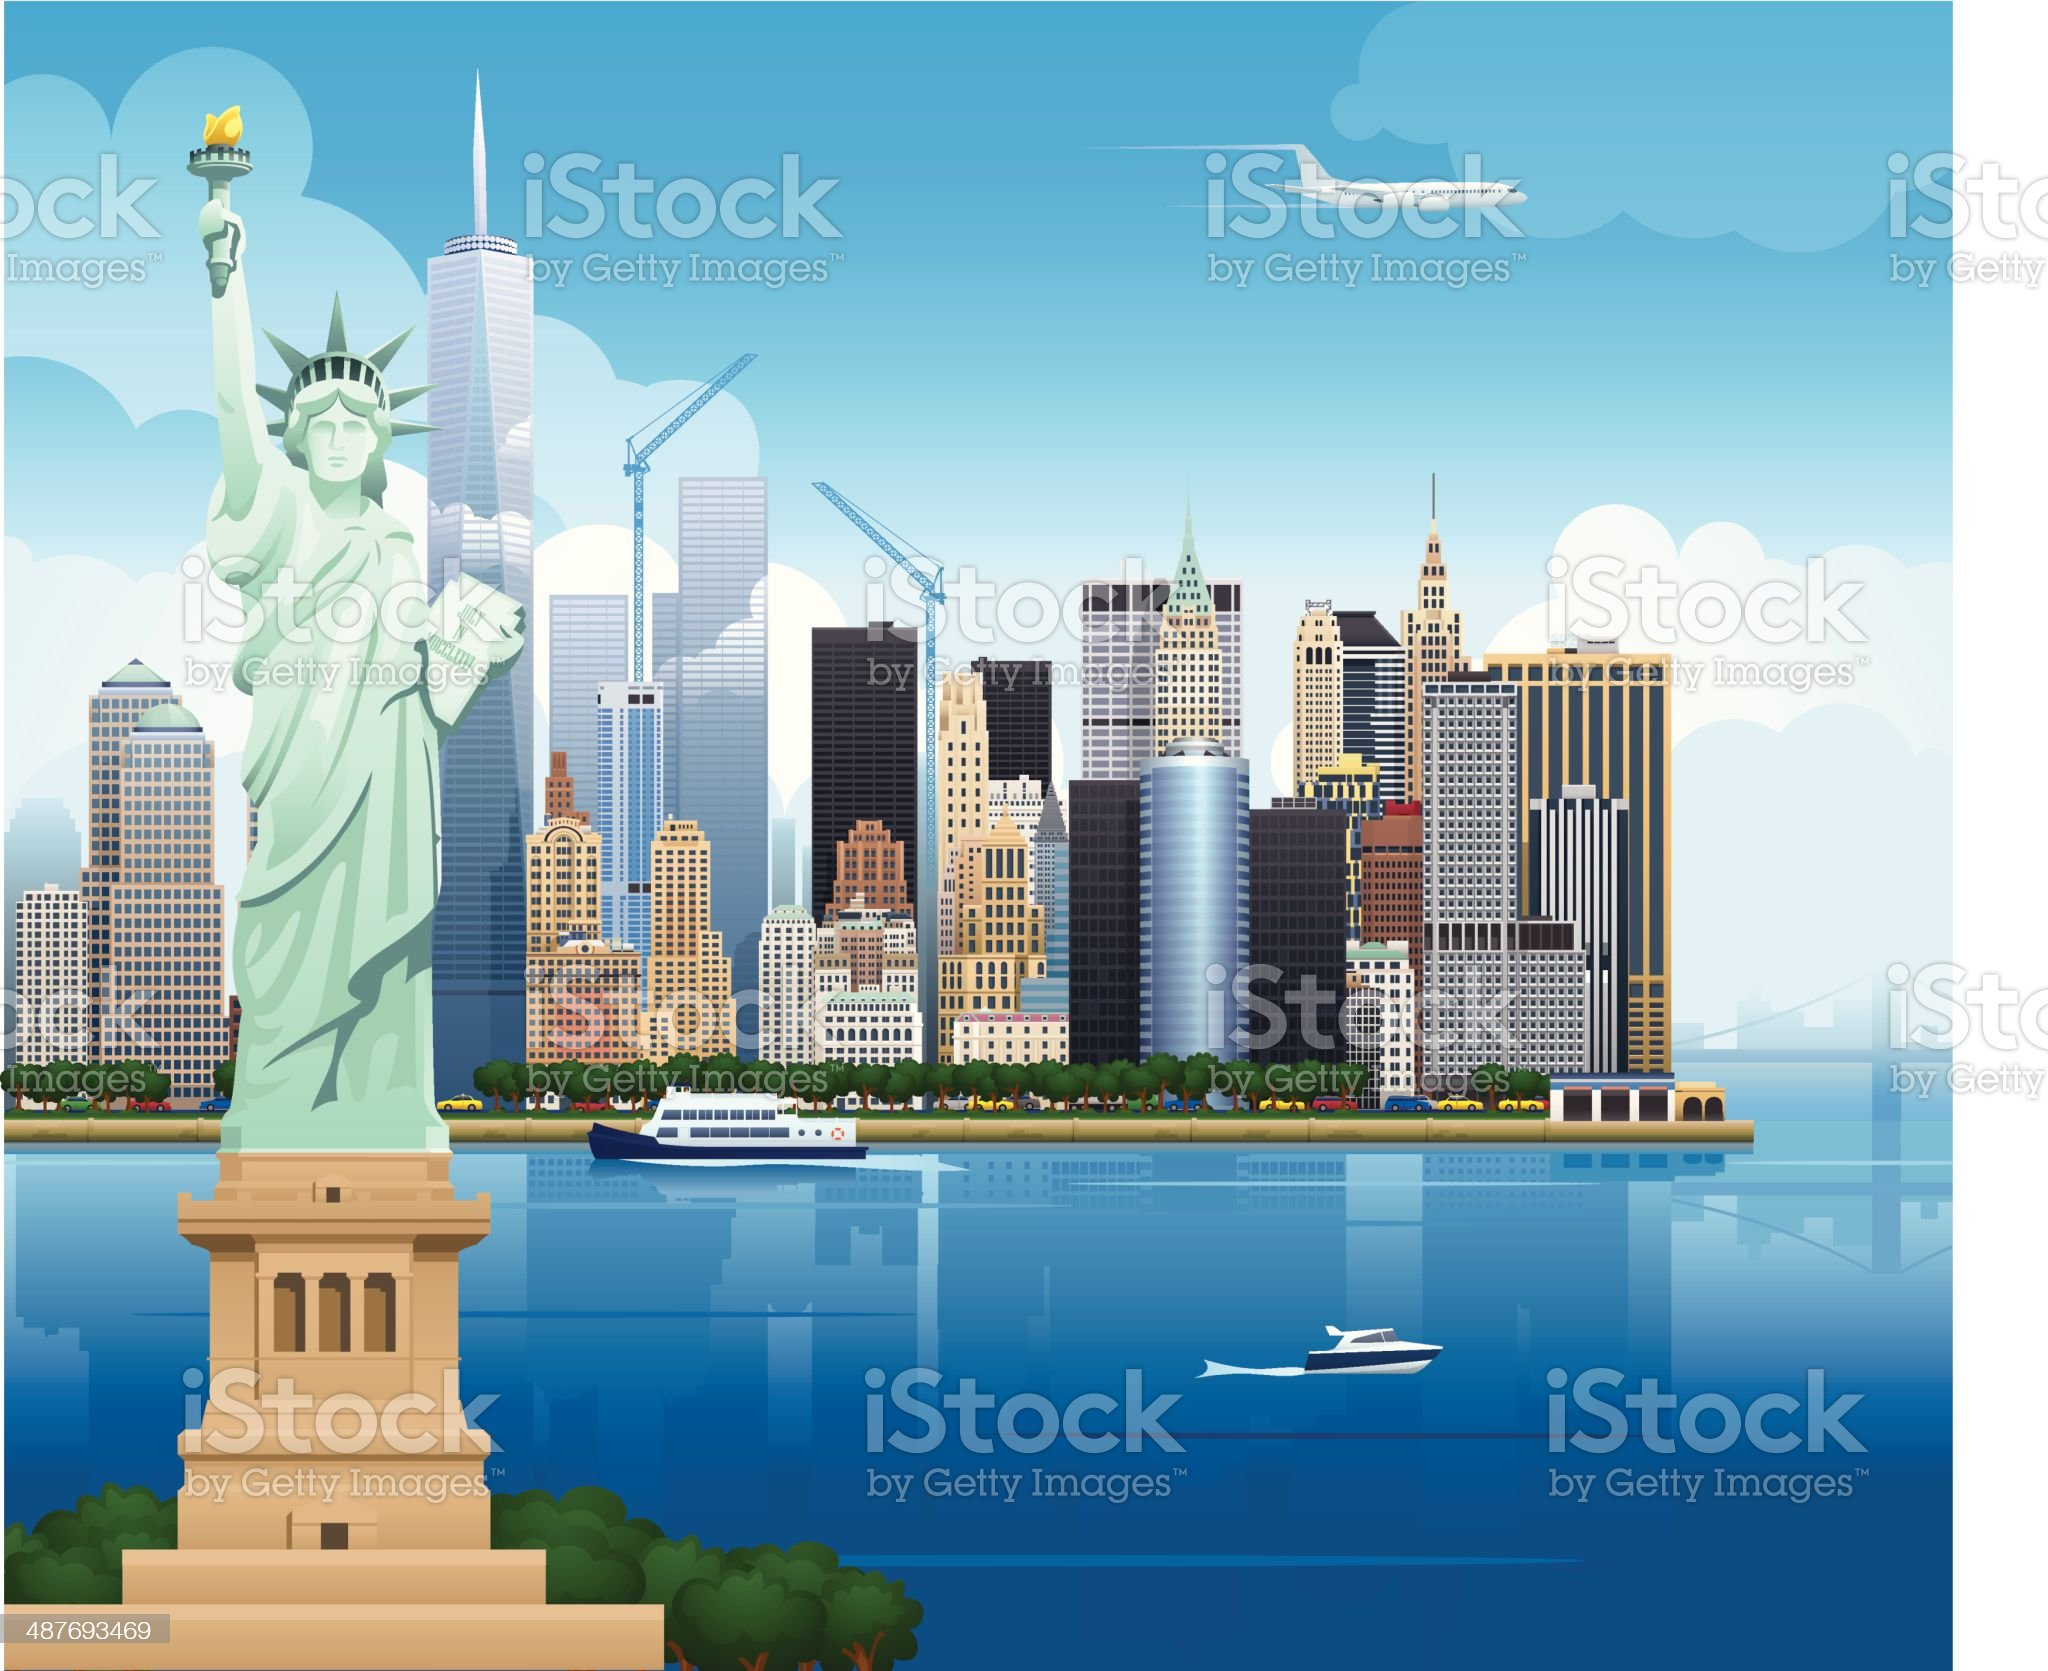 New York Skyline - Illustration royalty-free stock vector art